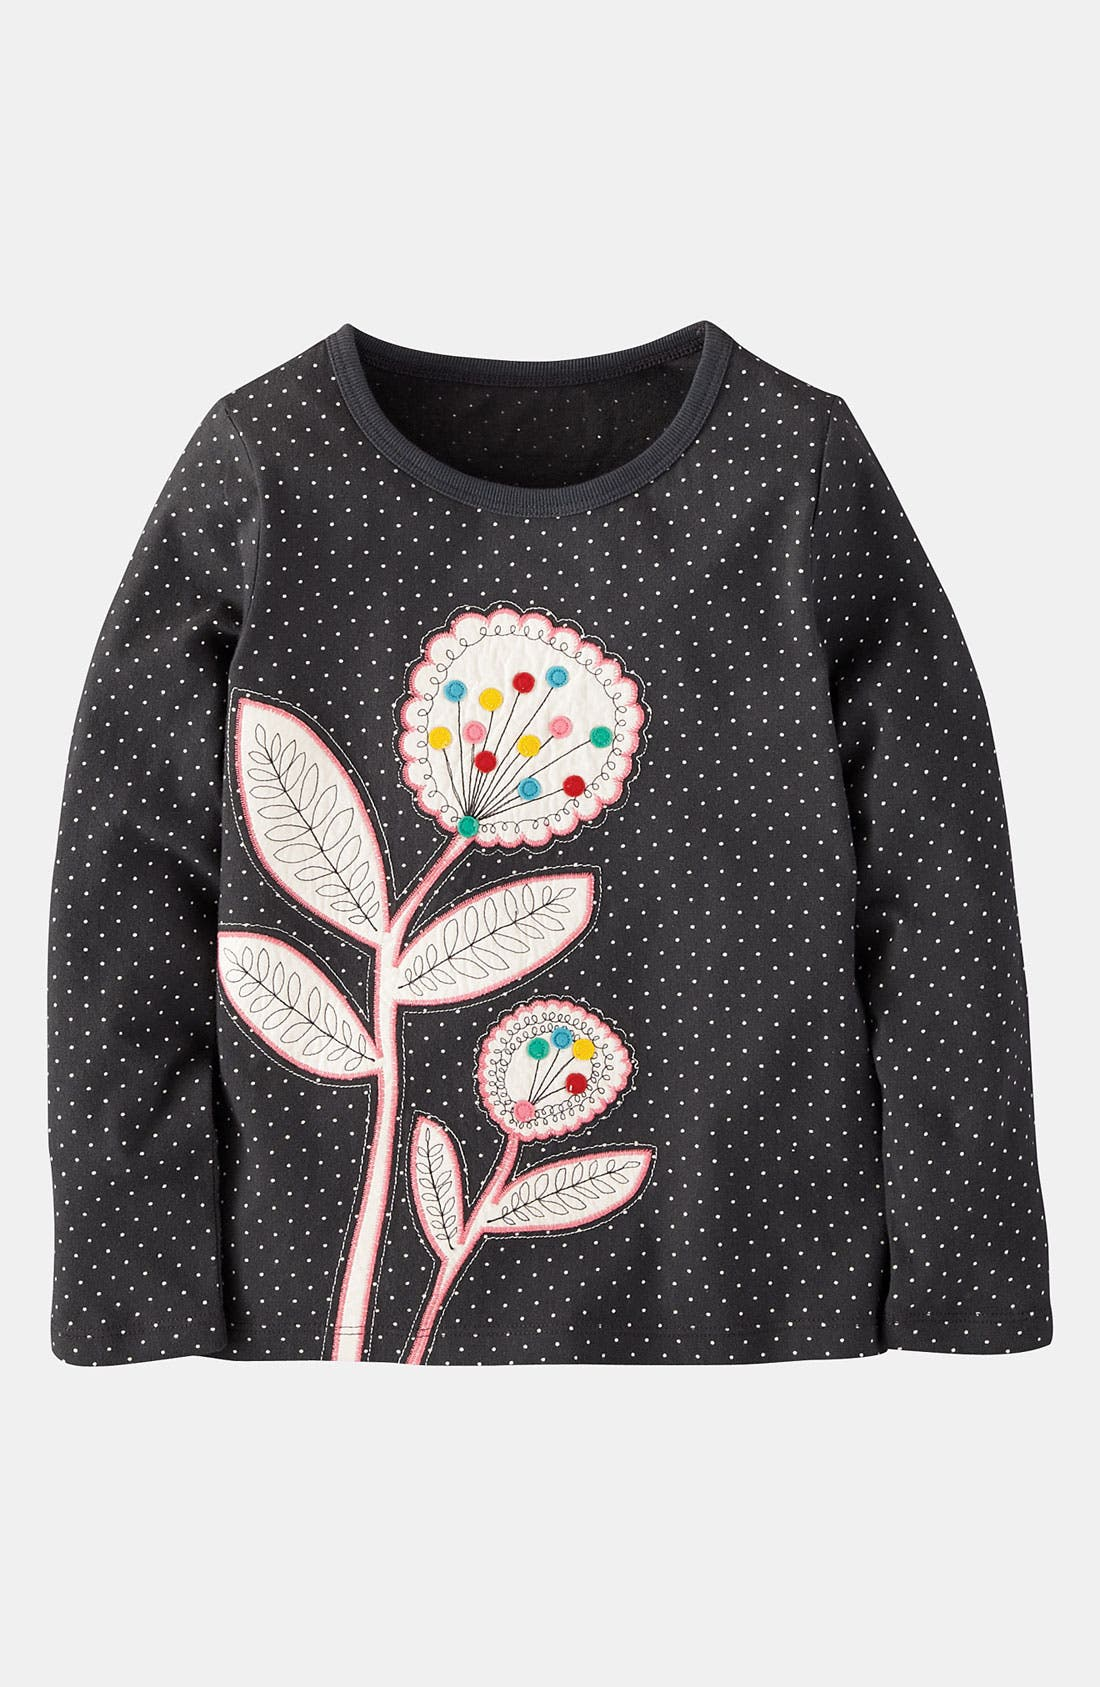 Main Image - Mini Boden 'Nordic Appliqué' Tee (Toddler, Little Girls & Big Girls)